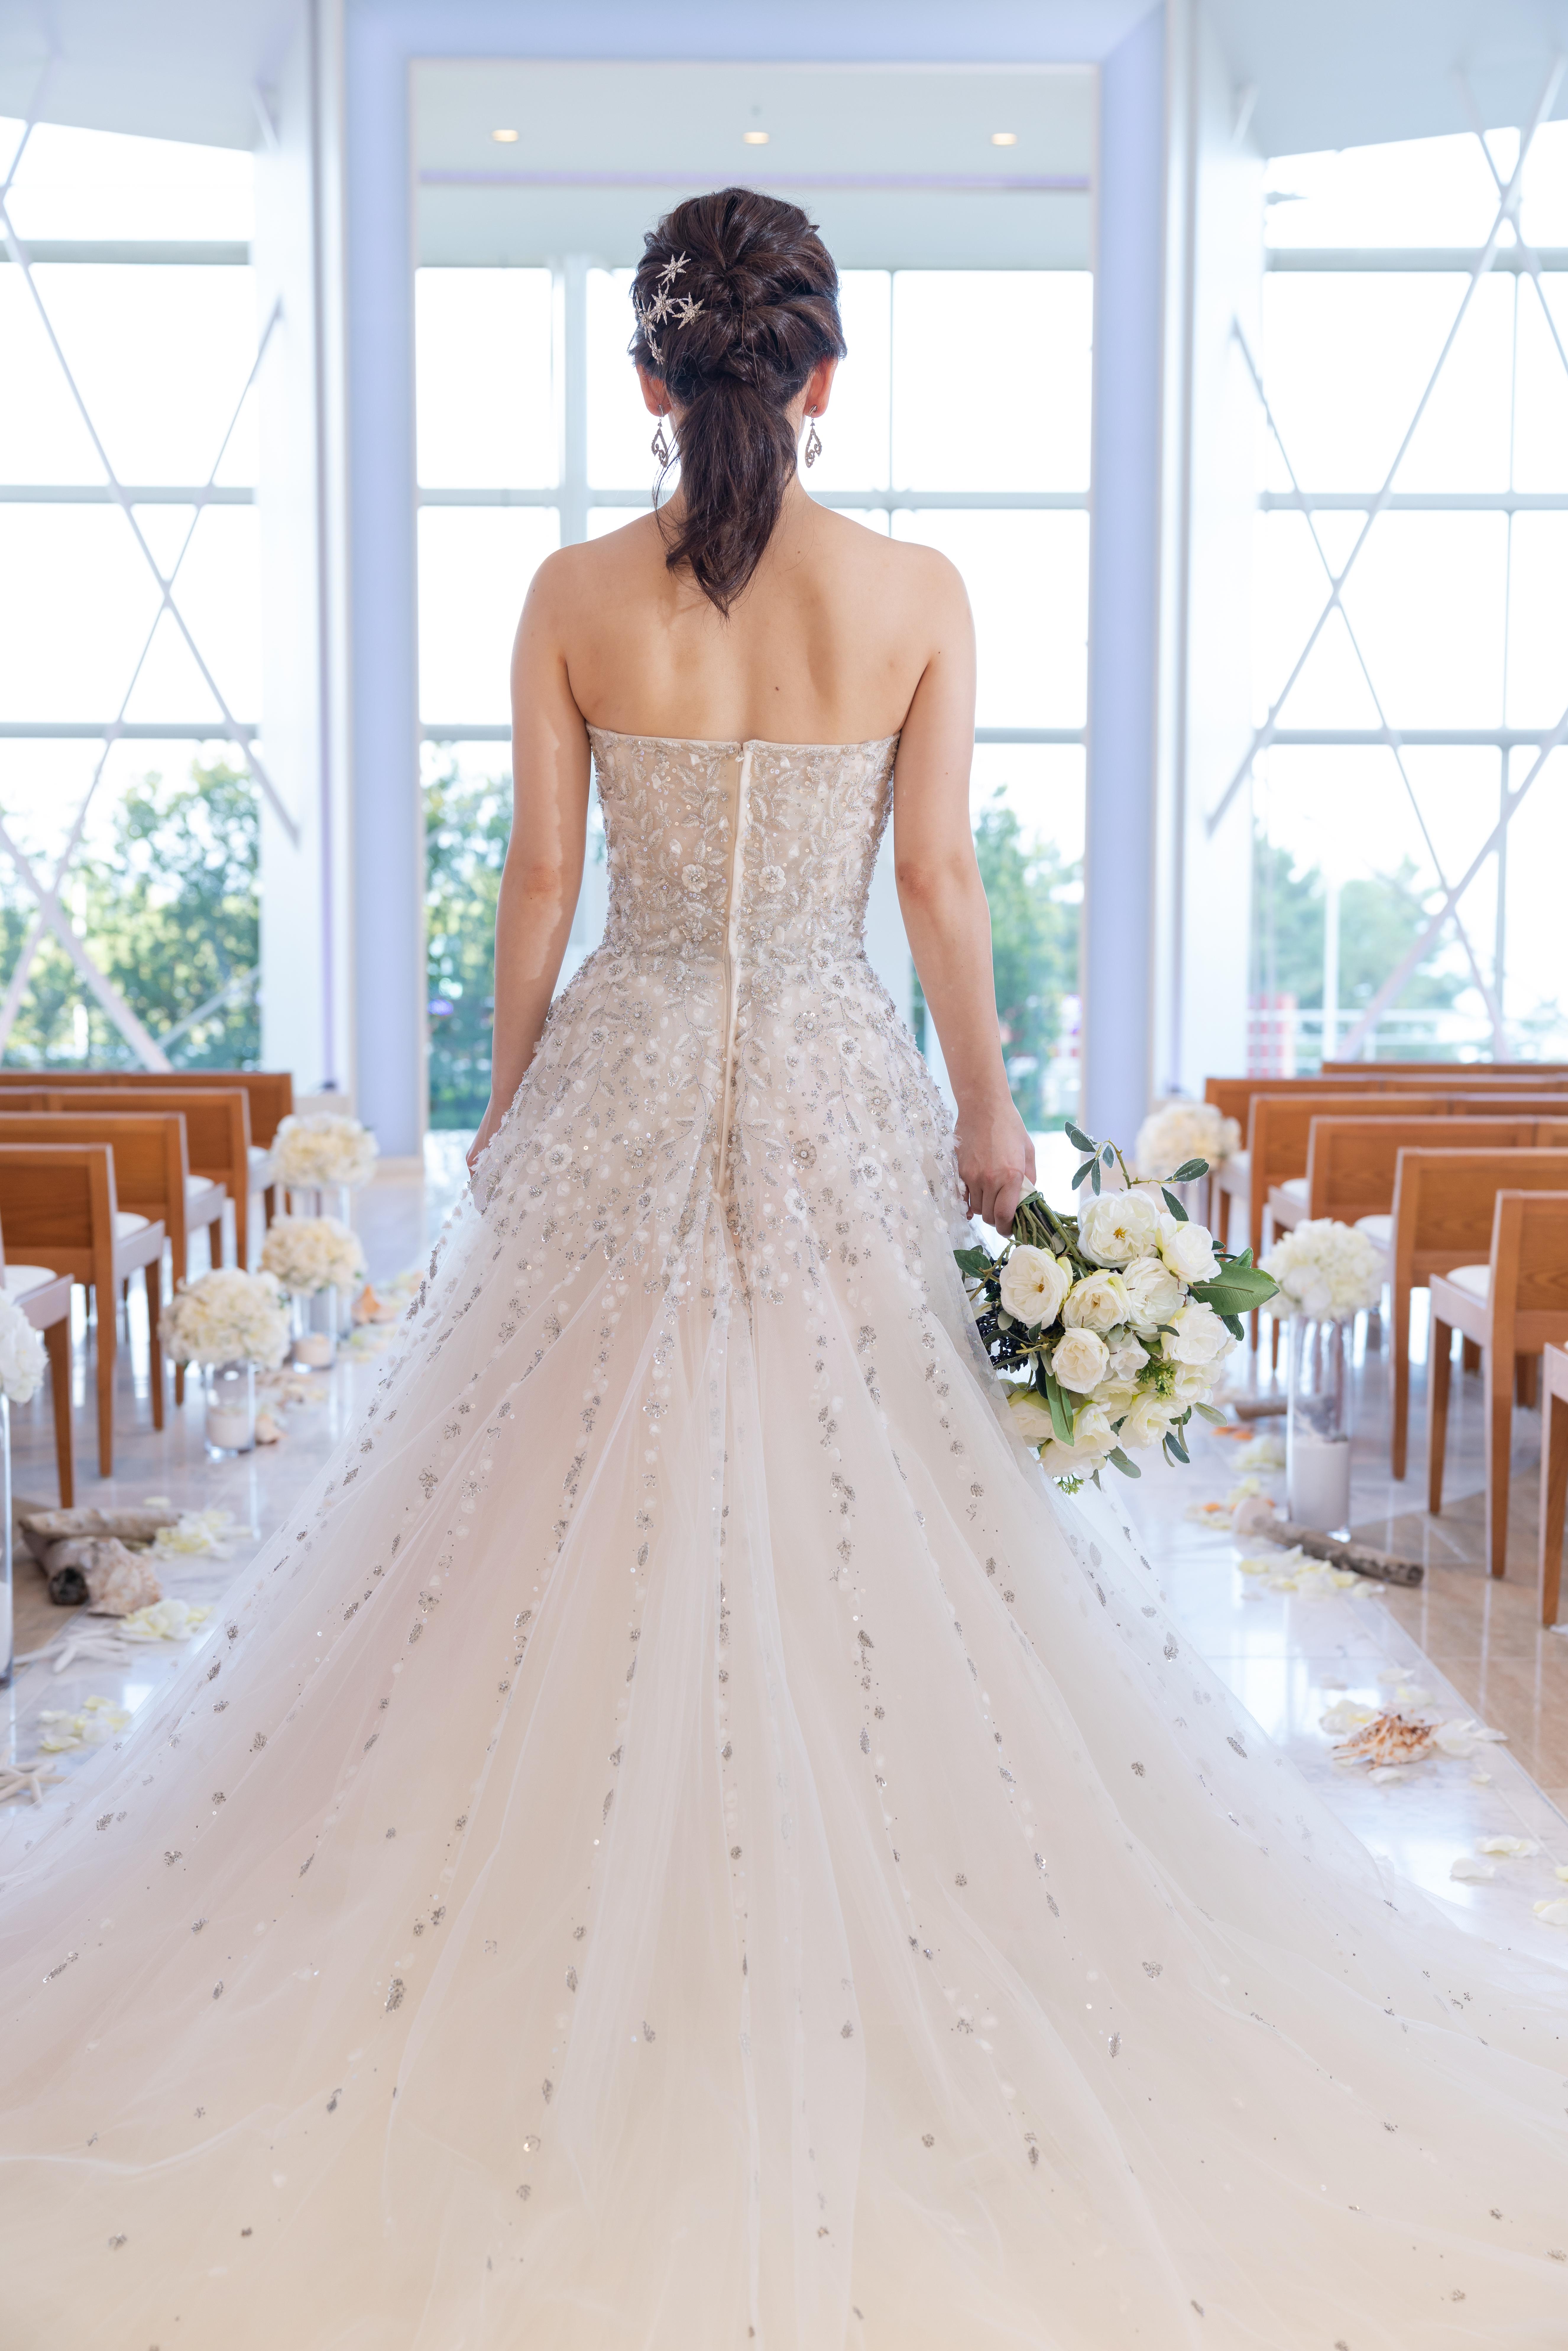 INESDISANTOの華やかなハンドビーディングが輝く素敵なドレスで春のお式を